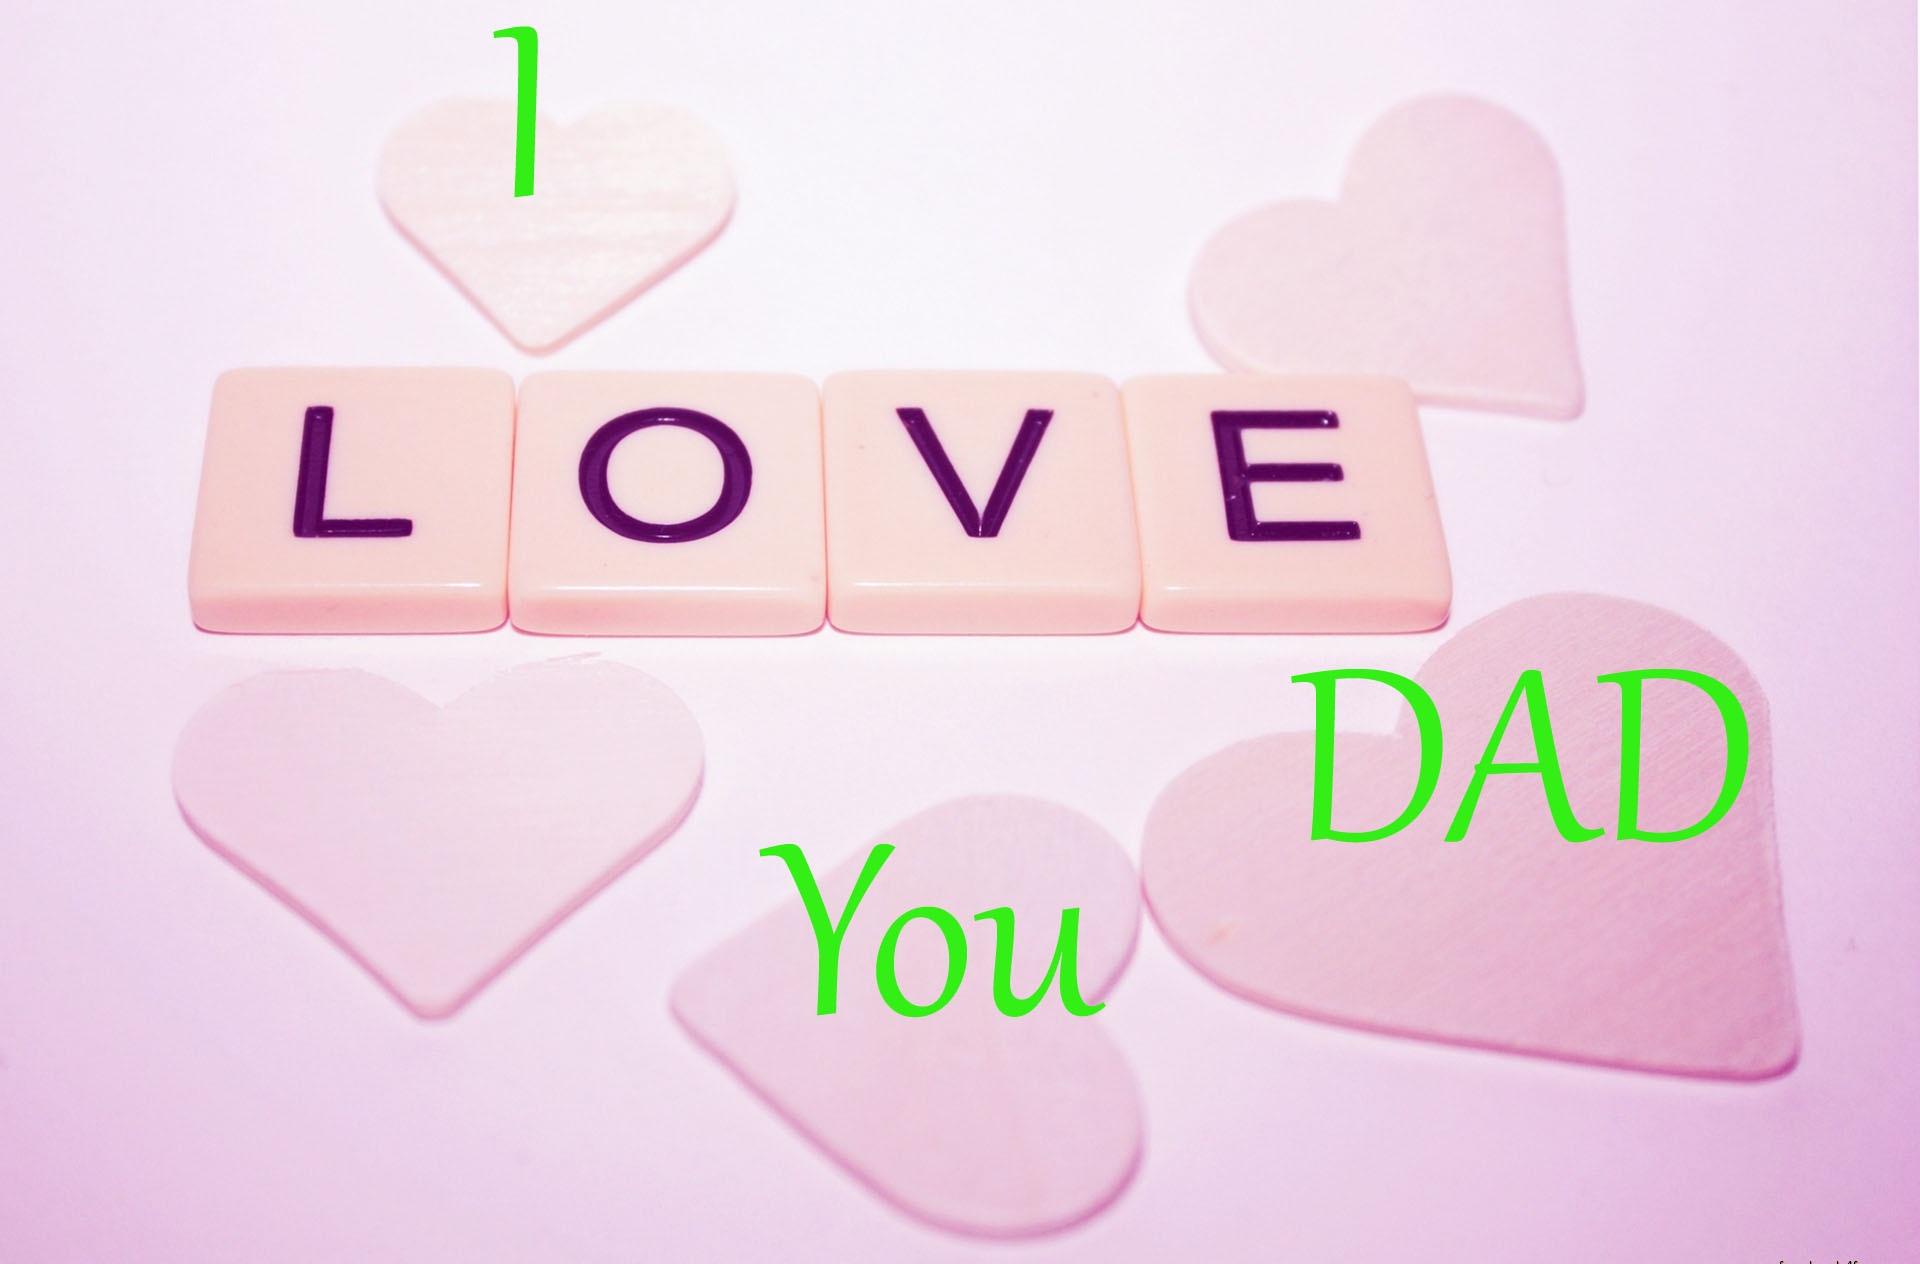 Wallpaper I Love You Dad : I Love Daddy Wallpapers - WallpaperSafari